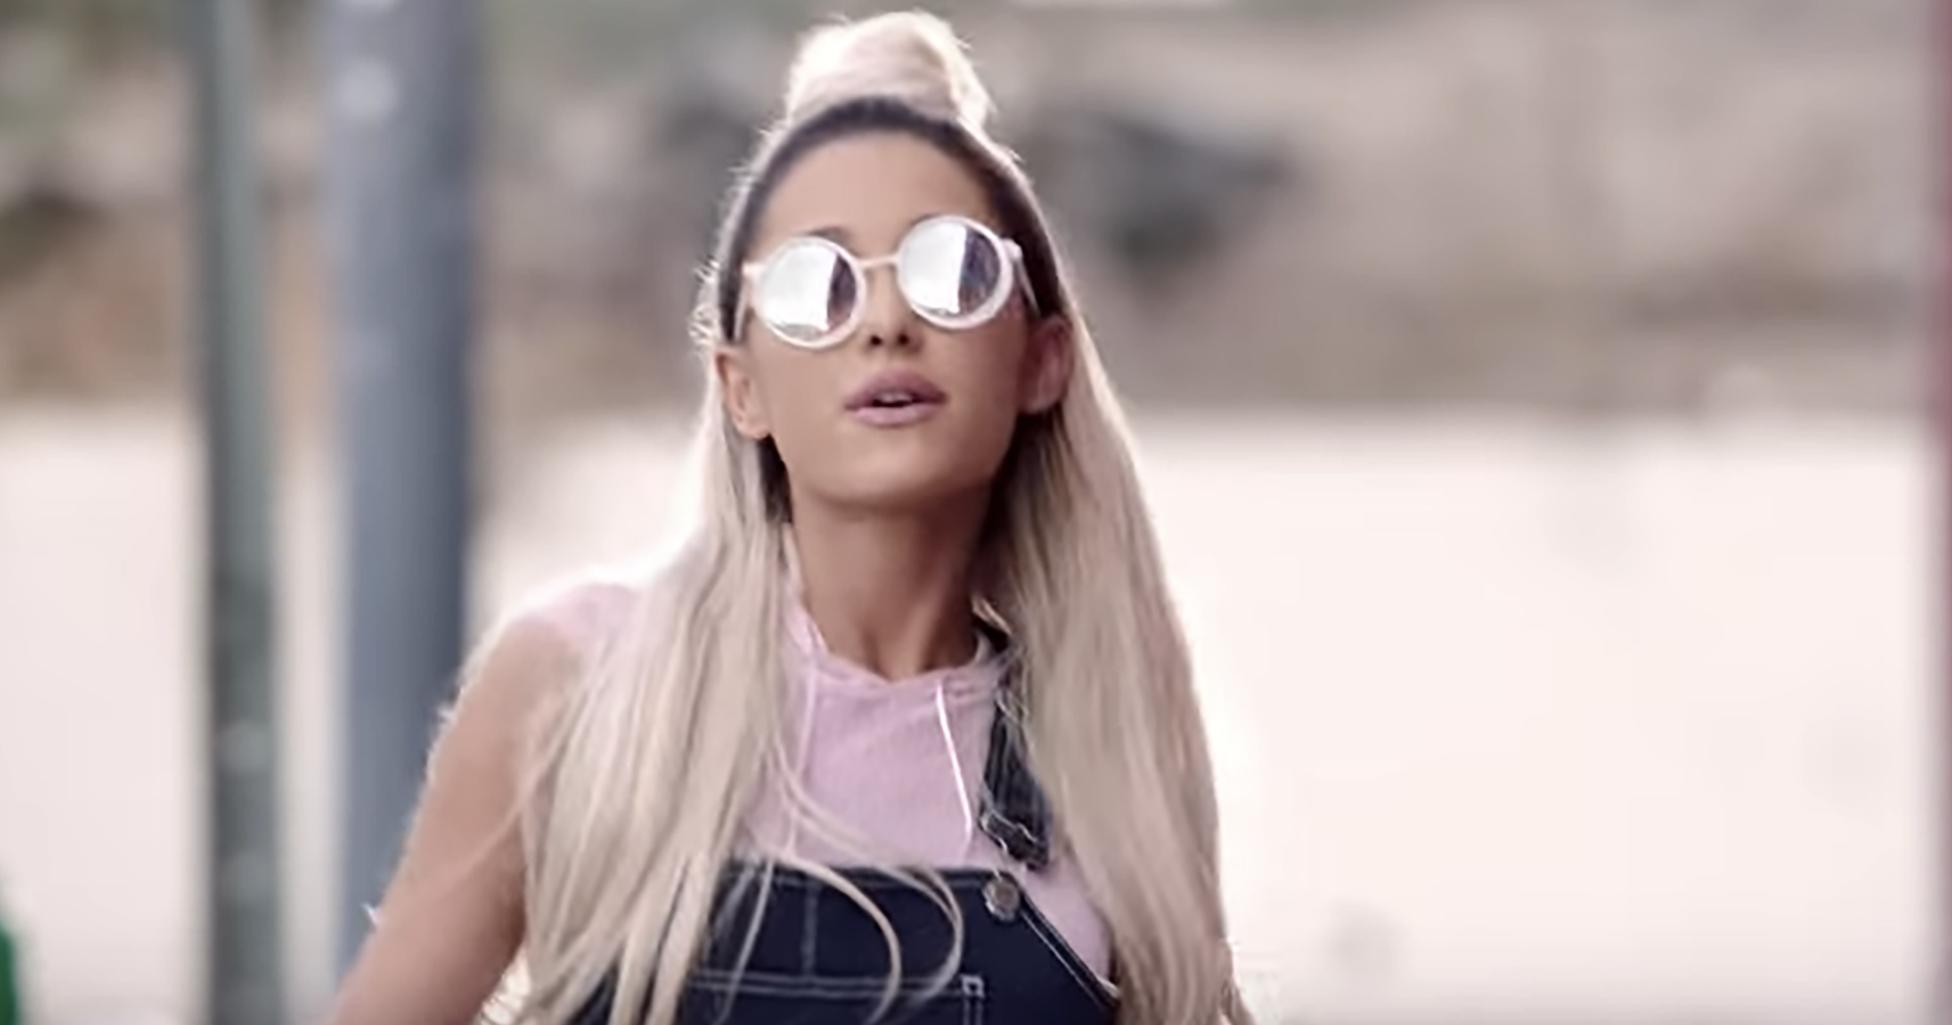 Ariana grande stevie wonder animated video sing movie